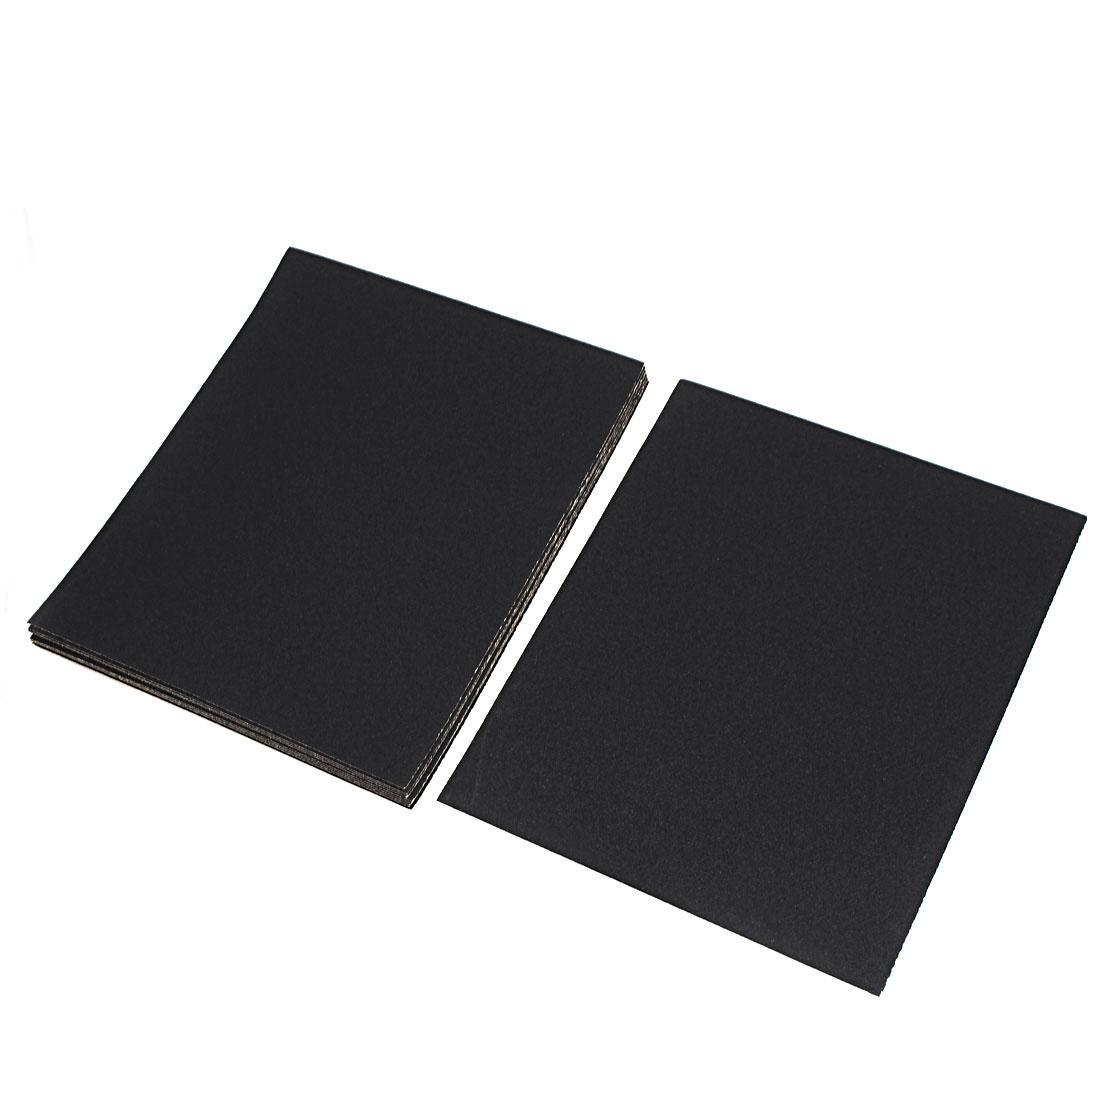 Grinding Polishing Tool Abrasive Sanding Sandpaper 100 Grit 10pcs